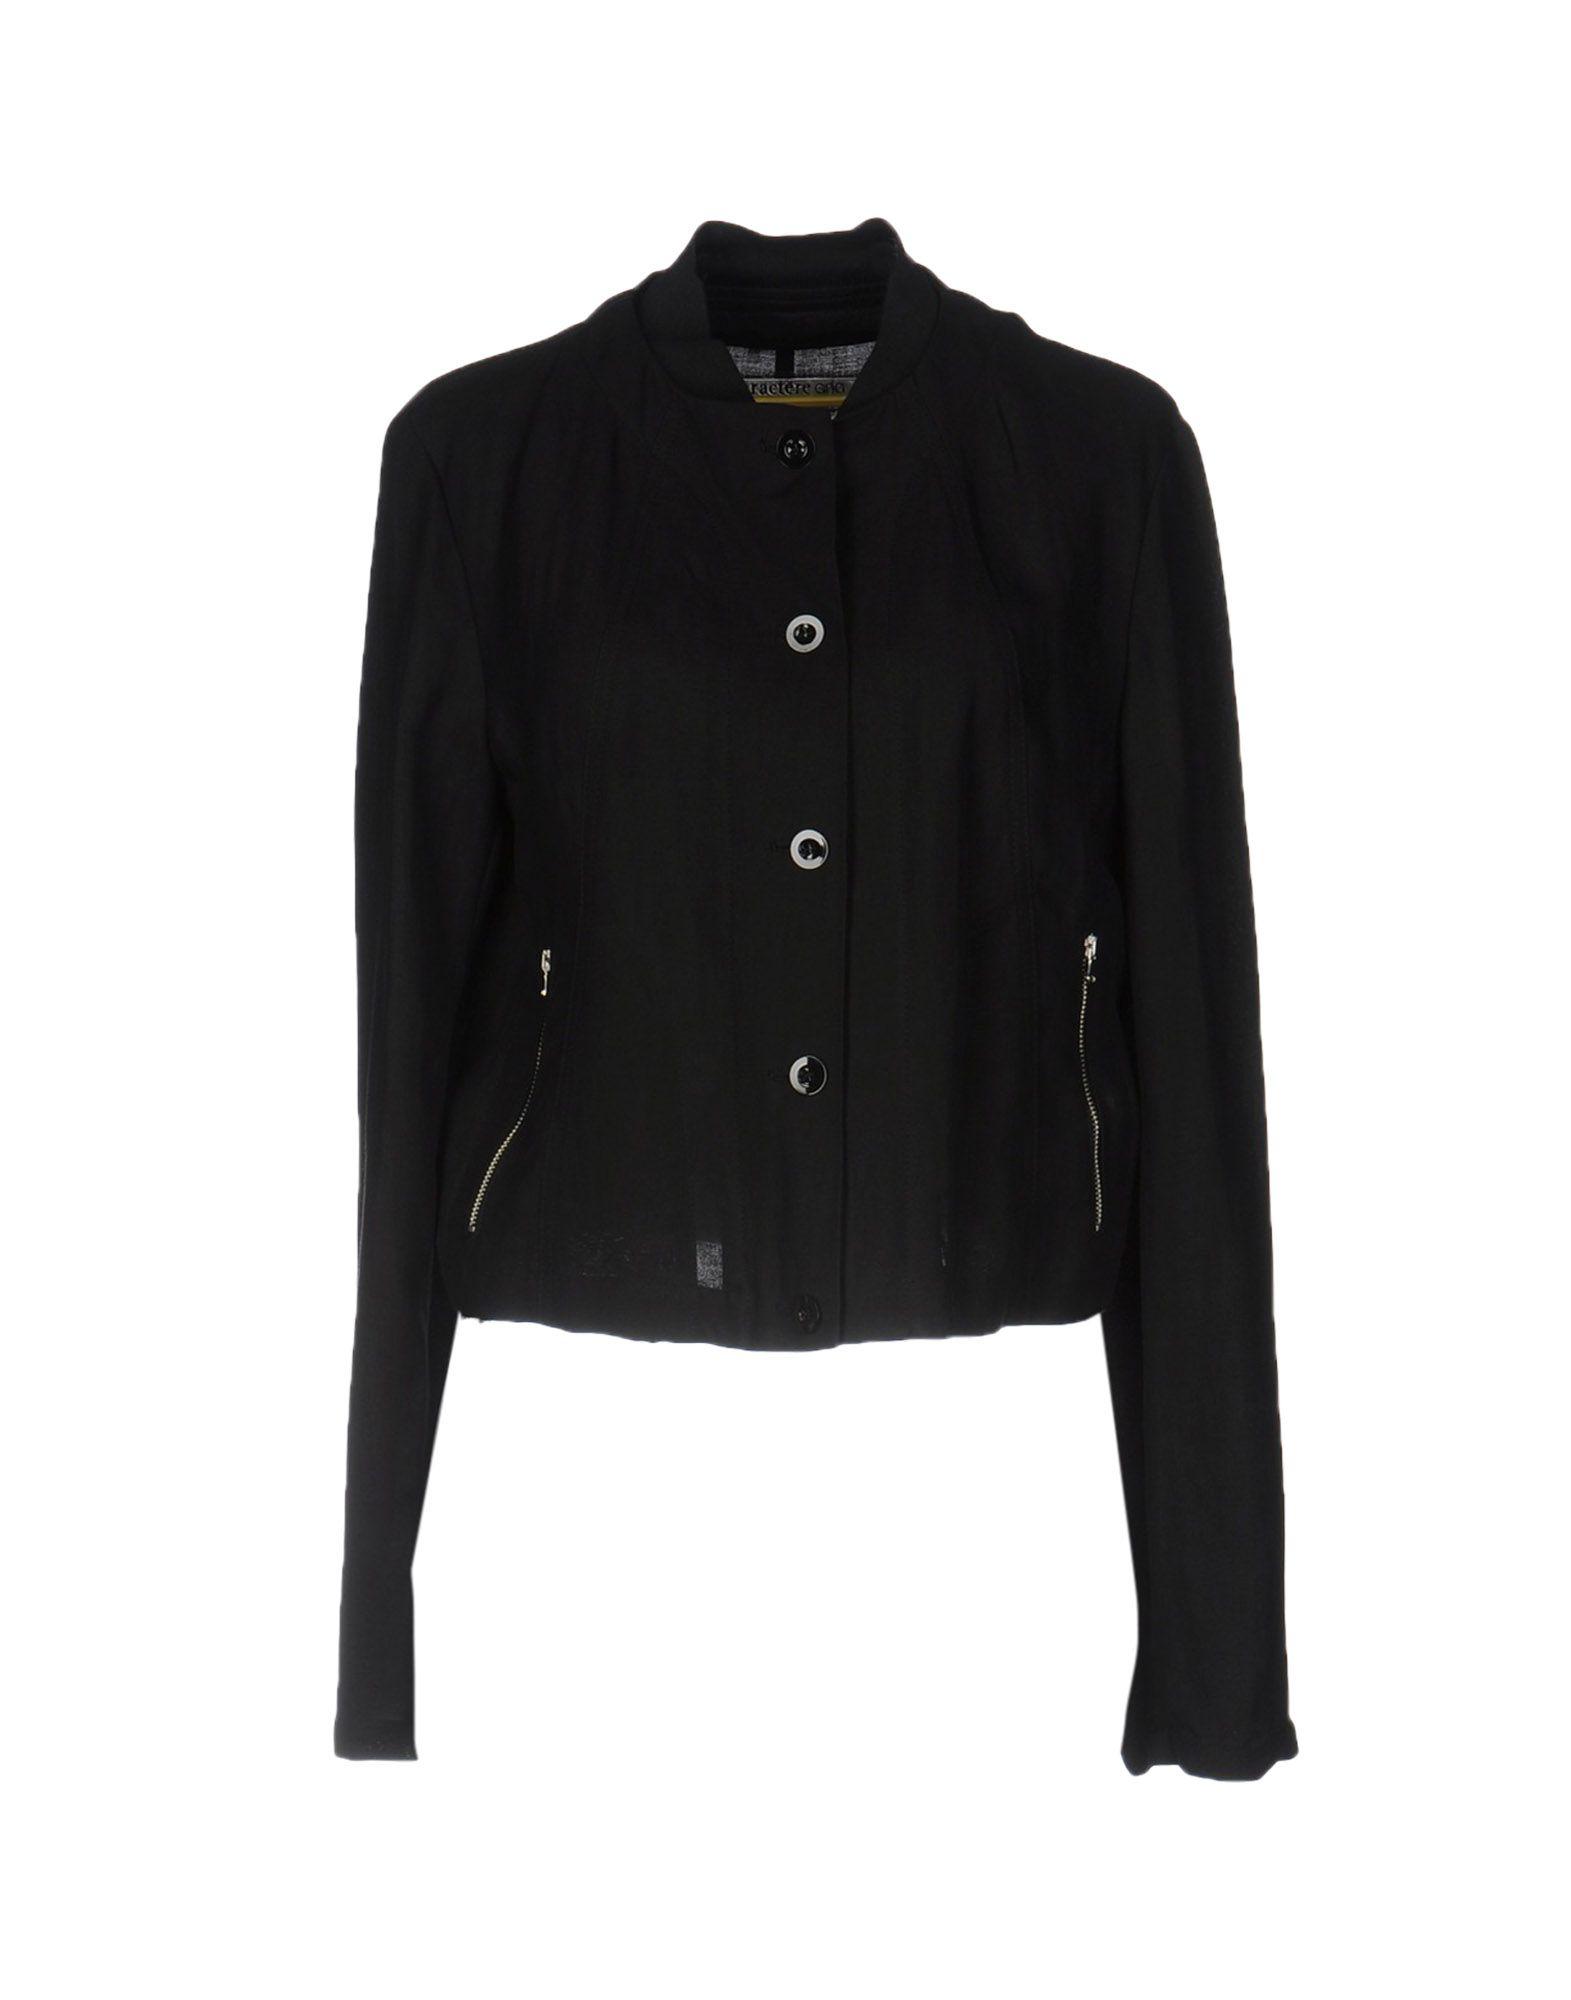 caractère aria куртка CARACTÈRE ARIA Пиджак